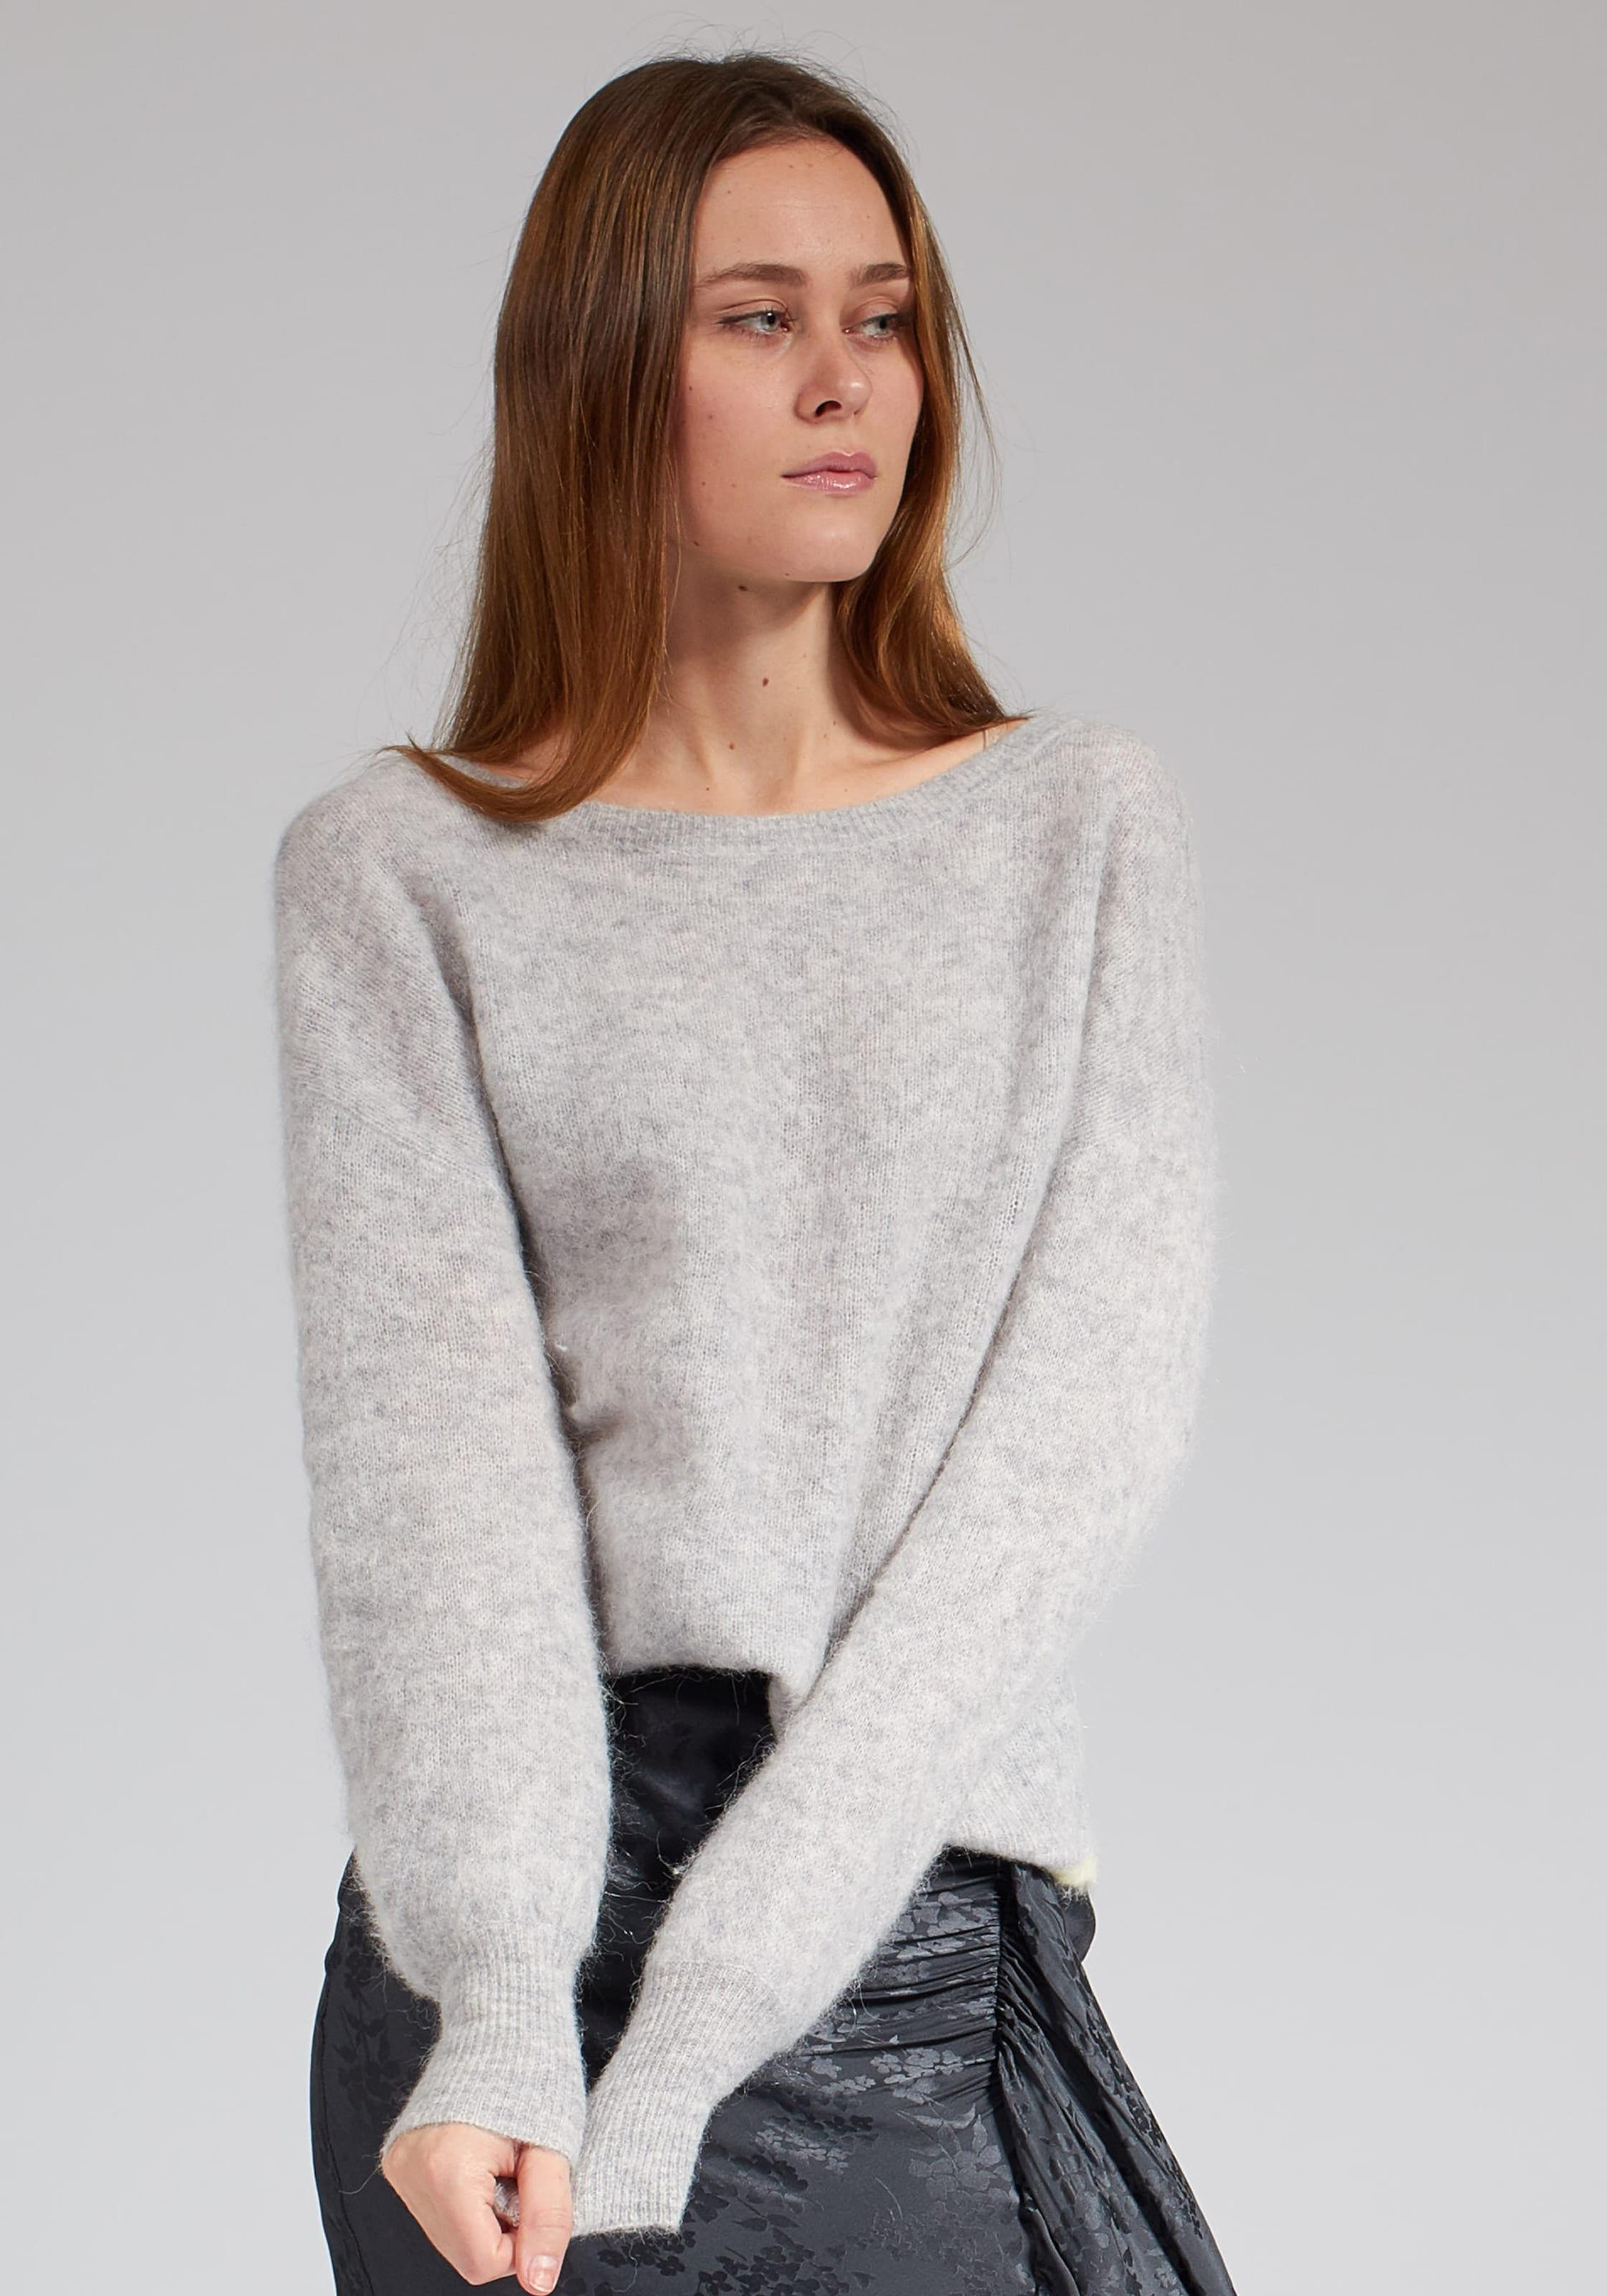 boot In Grau Pullover U ausschnitt Bloom OuXTwZiPk